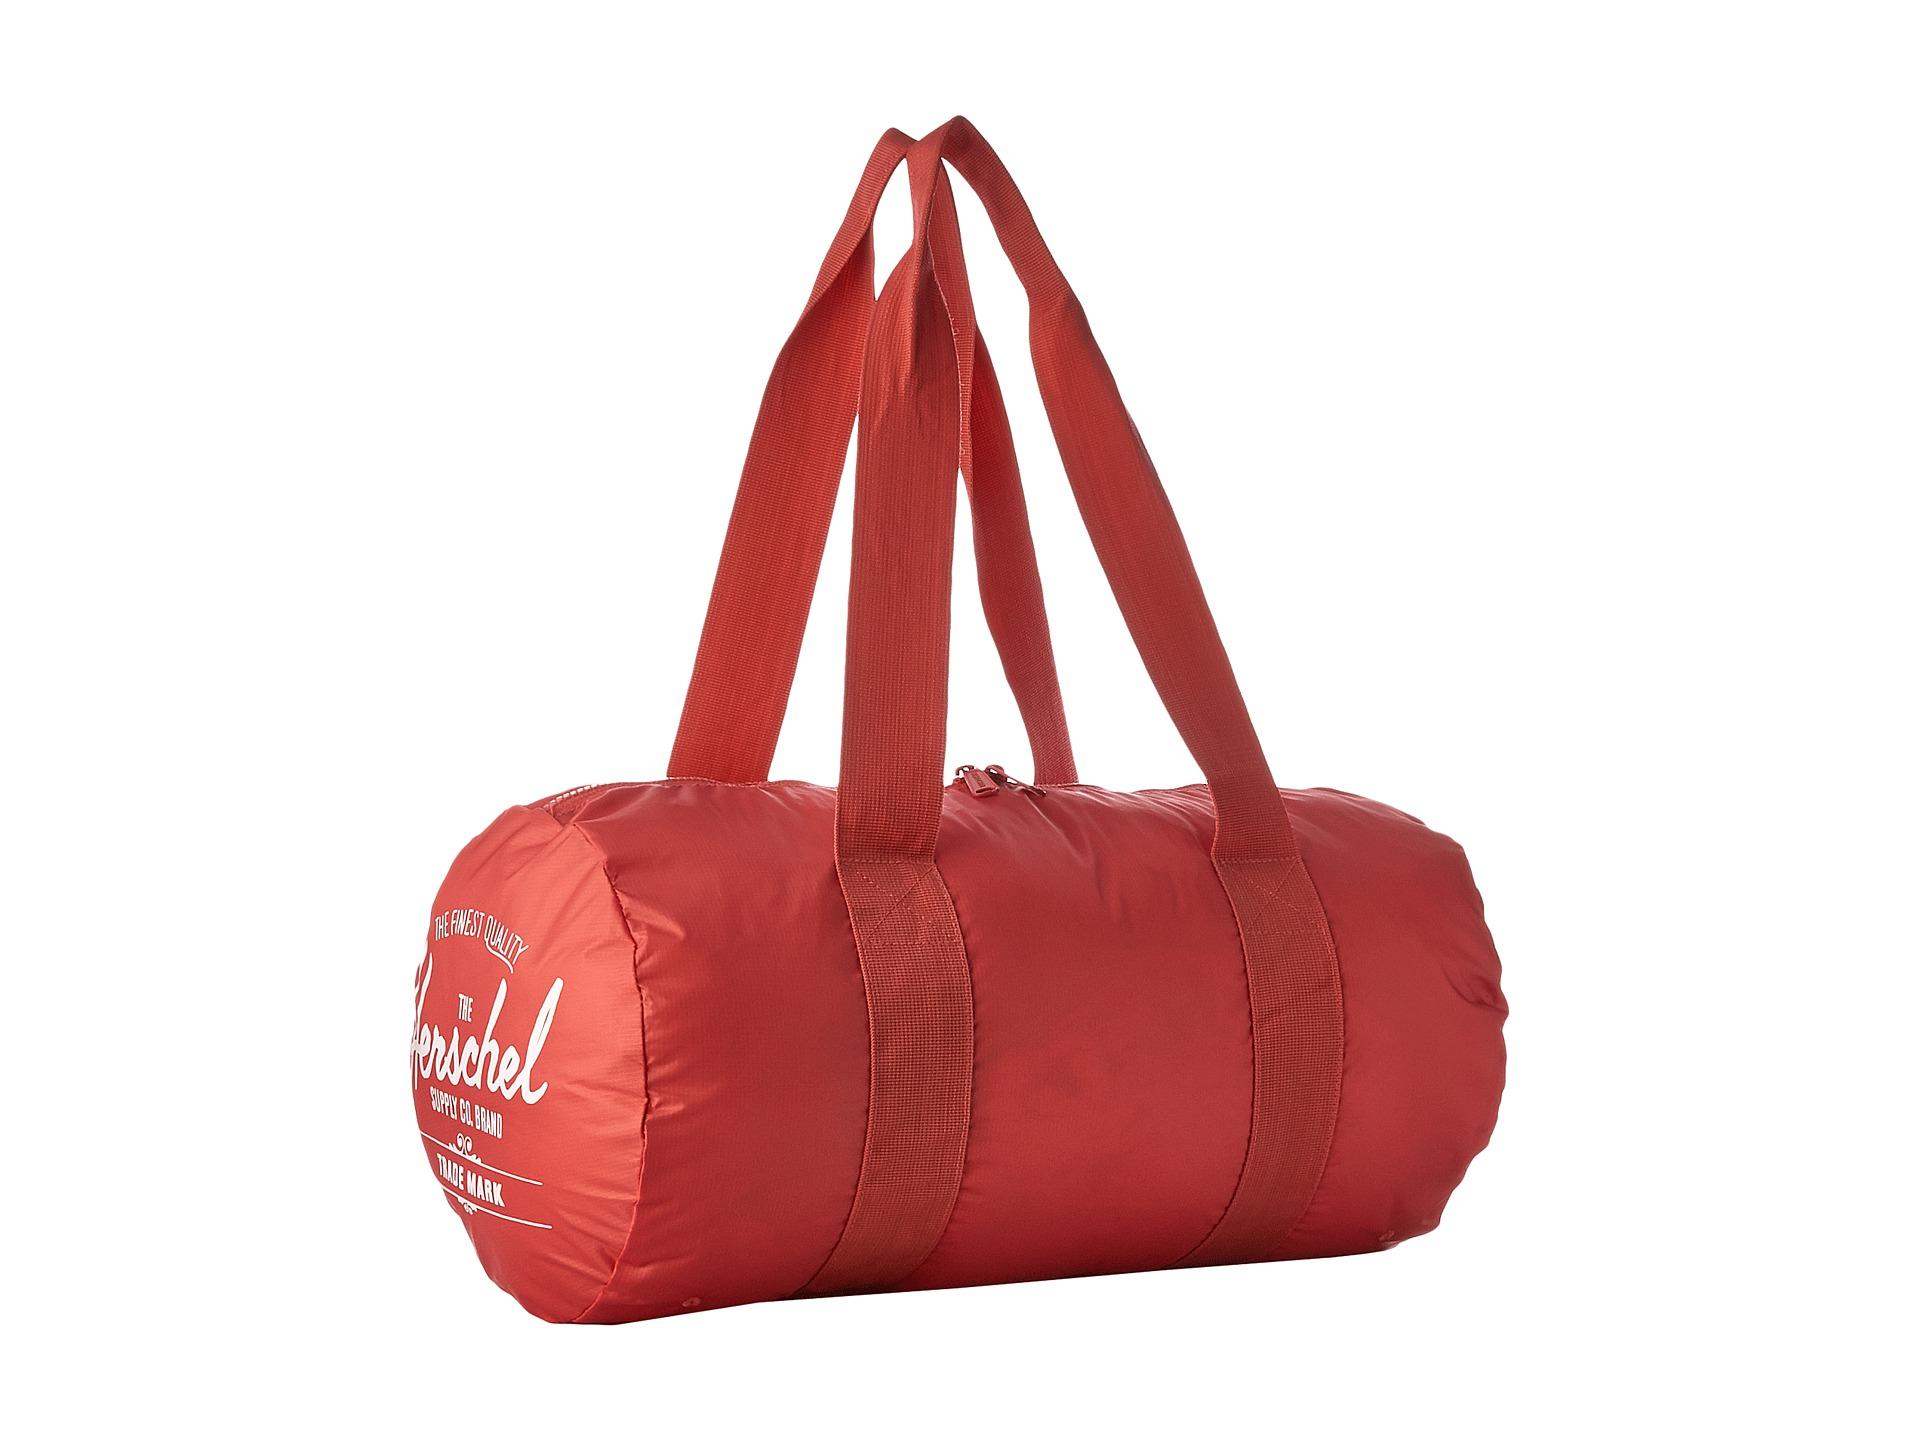 50b256122e59 Lyst - Herschel Supply Co. Packable Duffle Bag in Pink